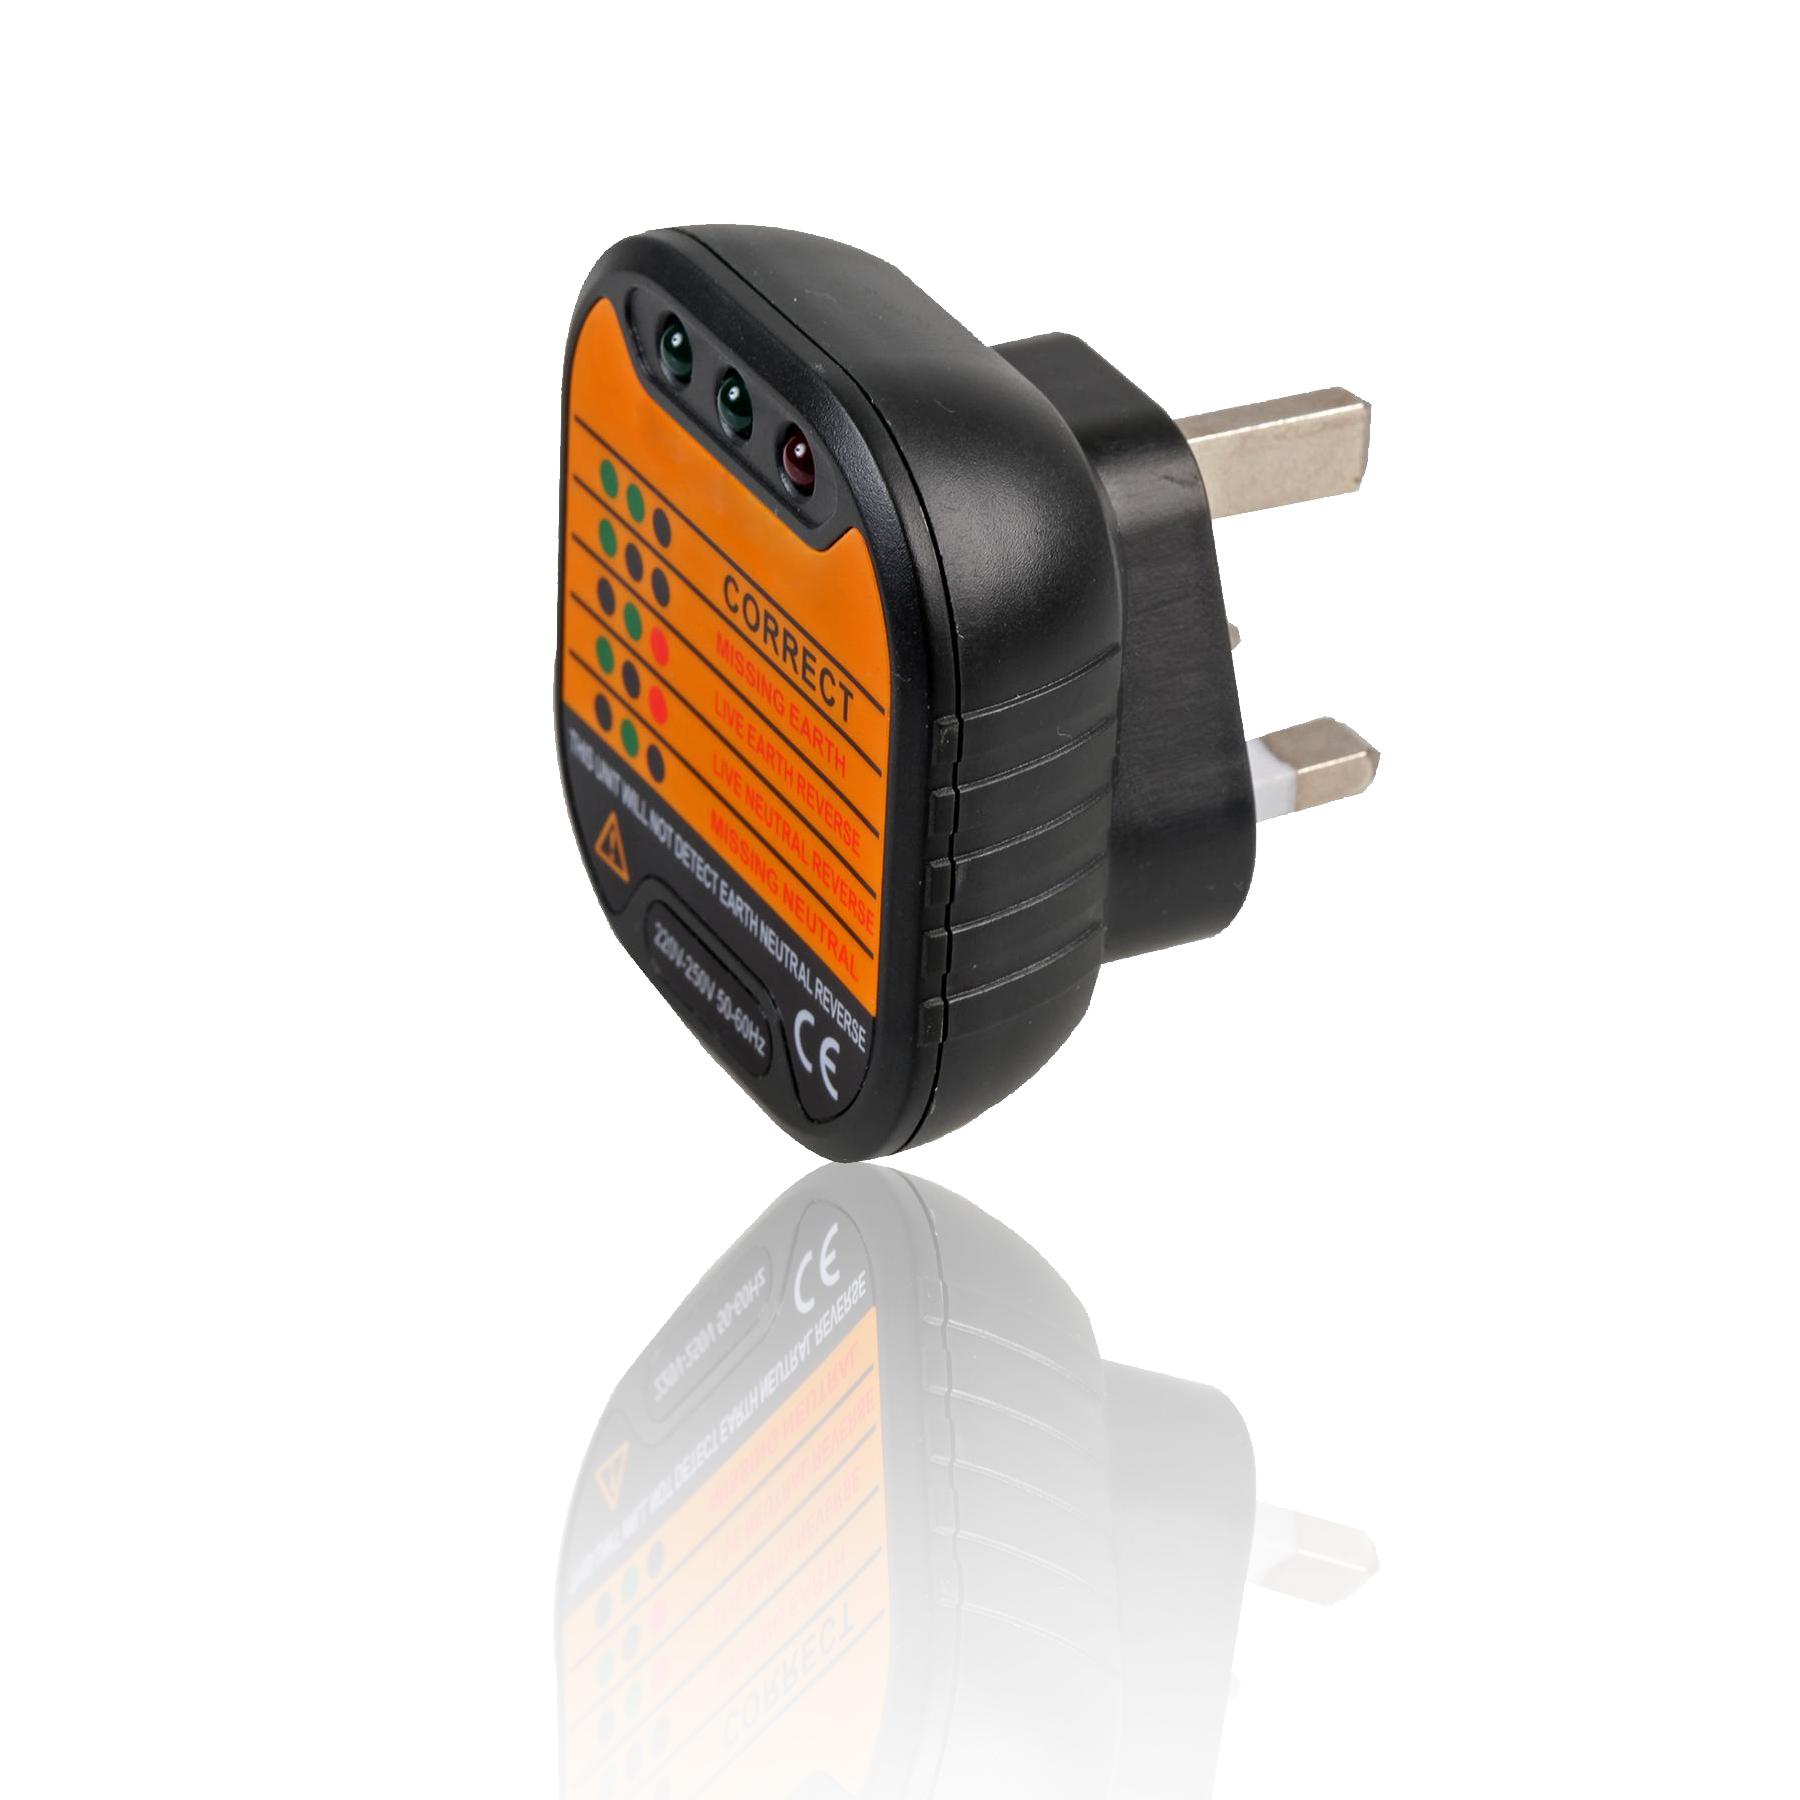 UK Mains Power Plug 13A 230v Socket Tester Wiring Safety Checker ...